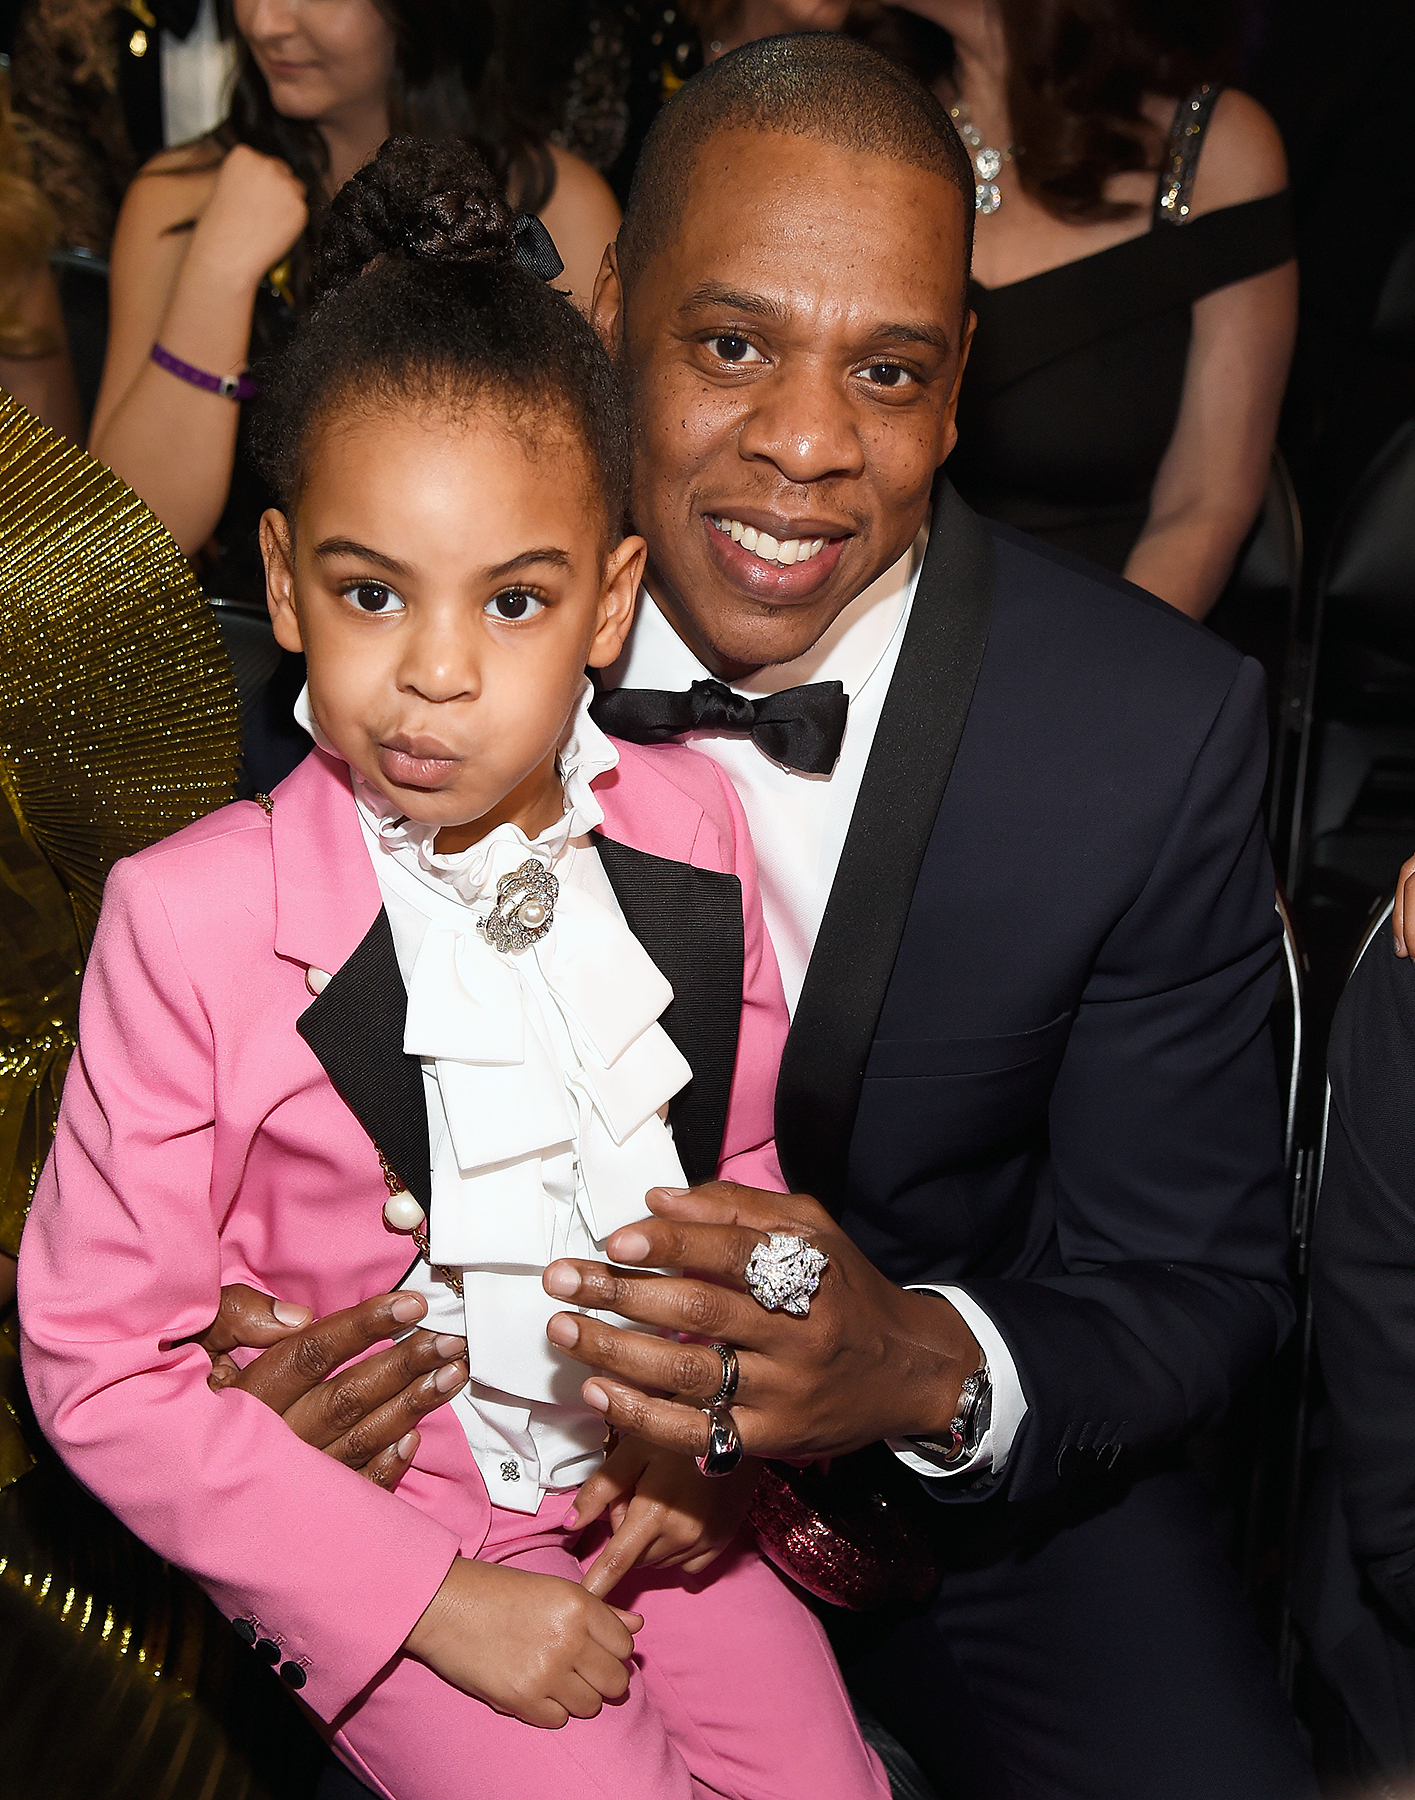 Blue Ivy Jay Z Grammys 2017